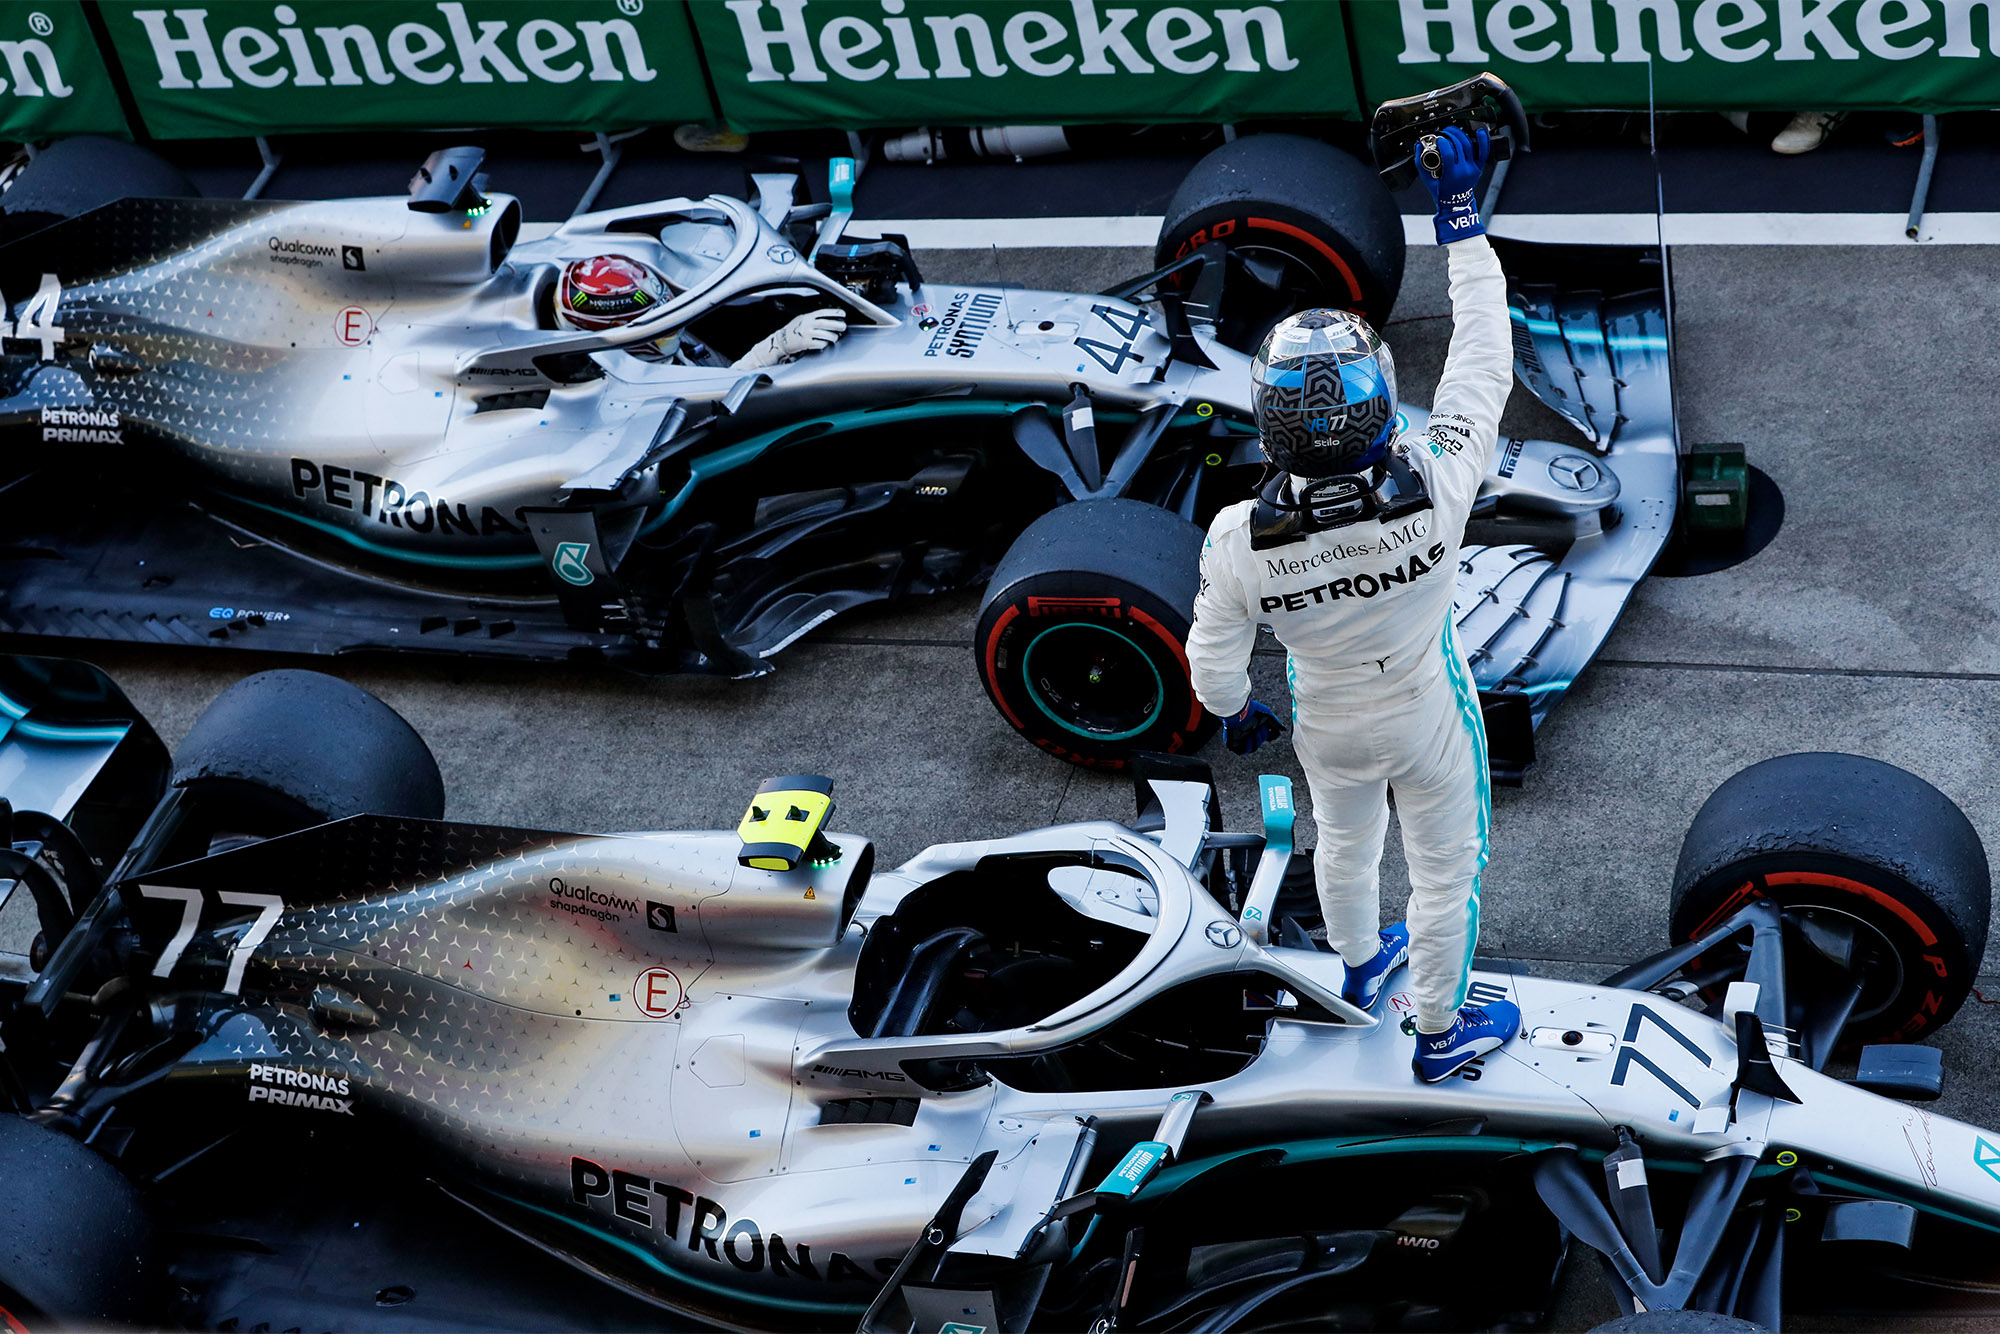 Valtteri Bottas celebrates winning the 2019 Japanese Grand Prix